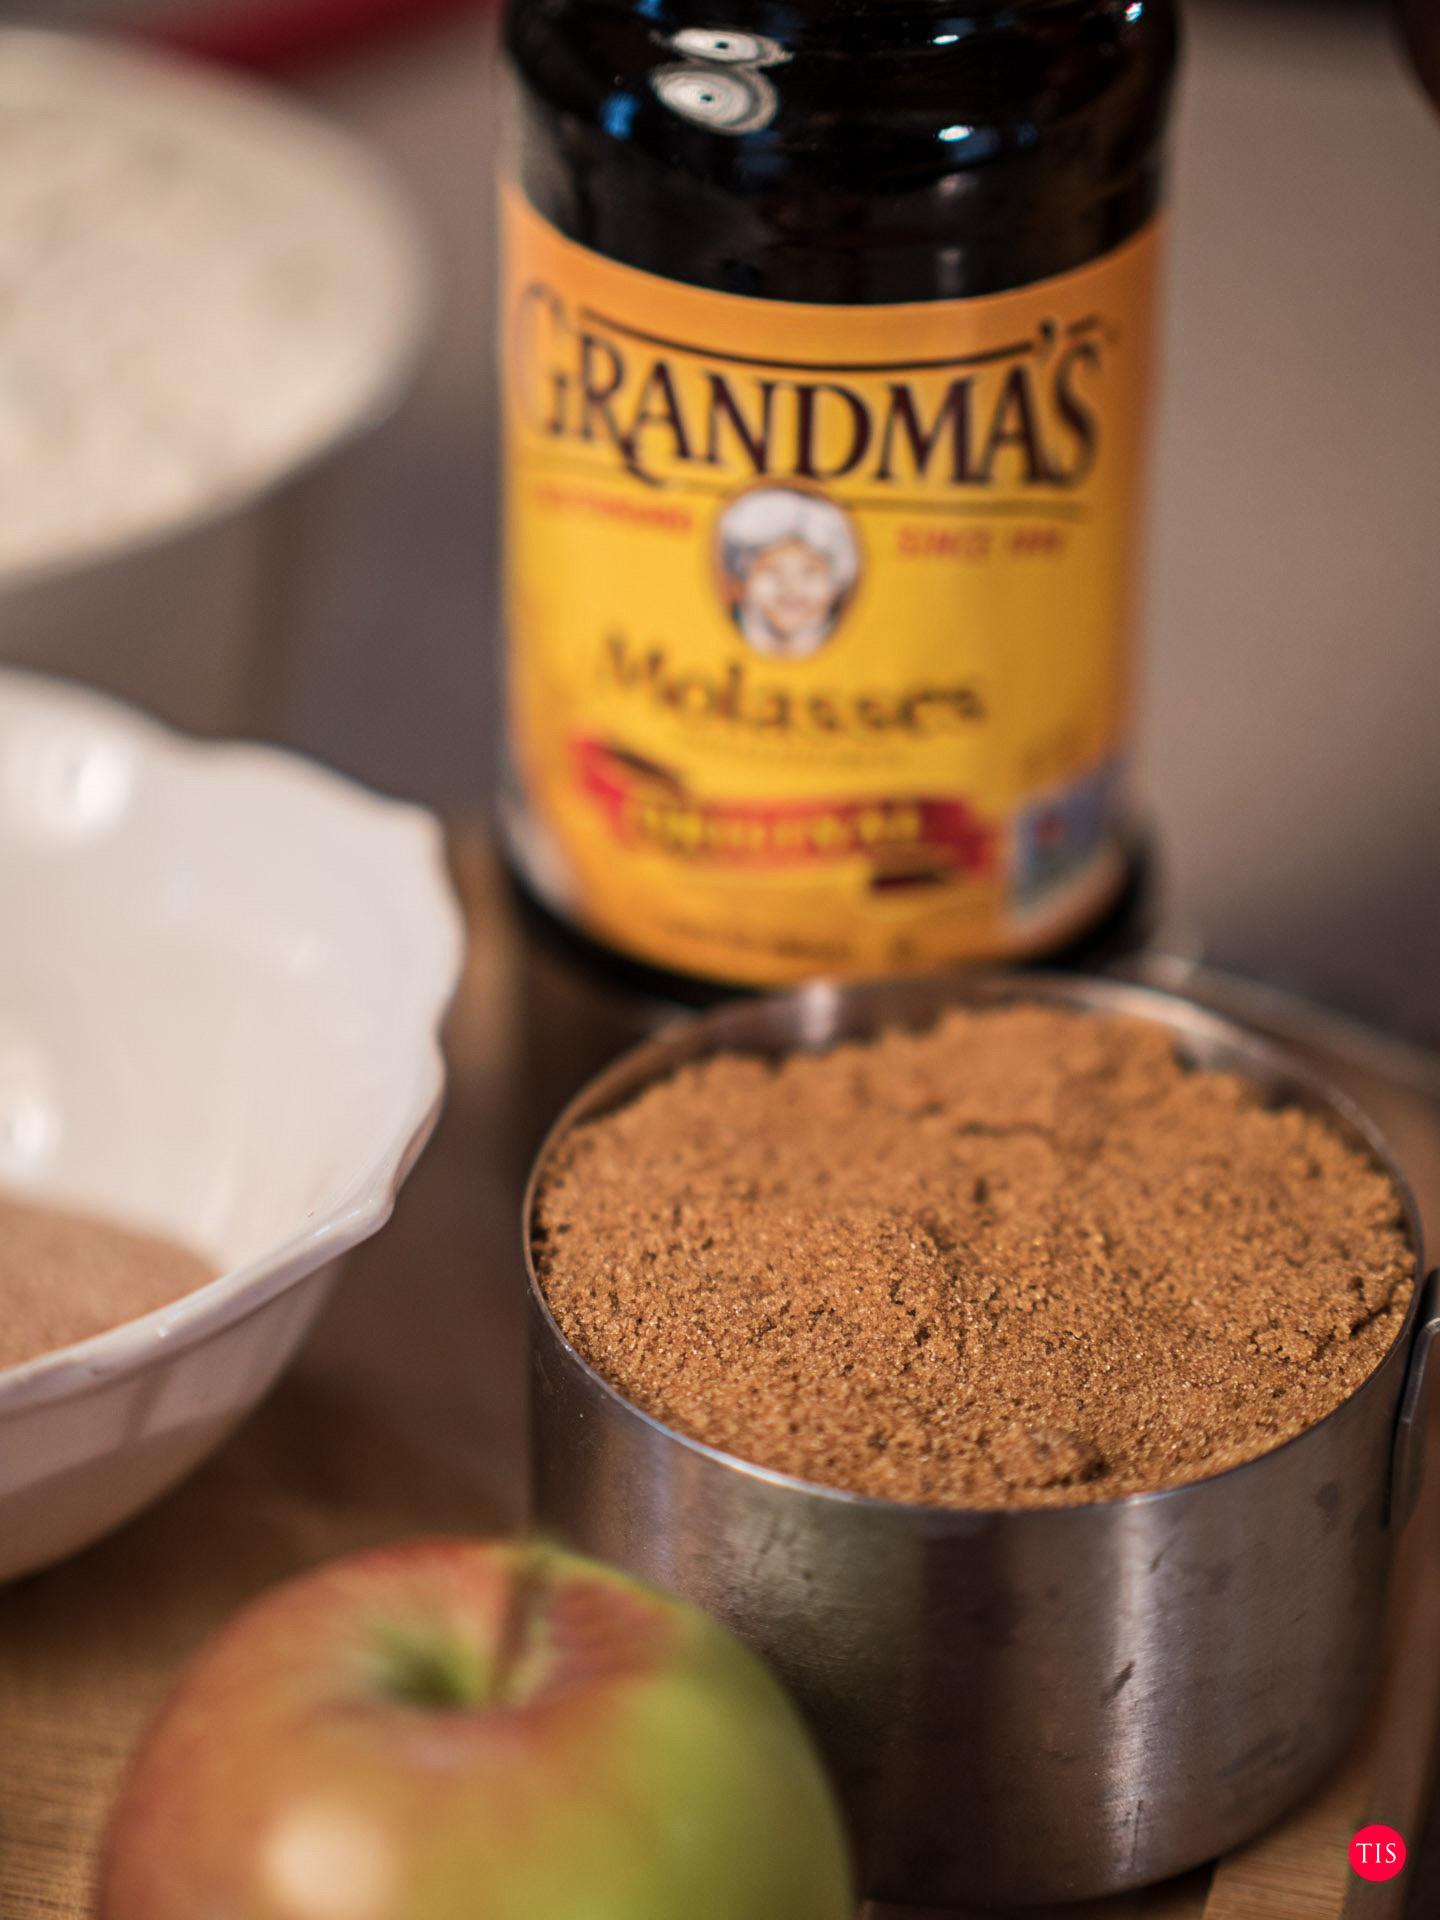 Grandma's Molasses - 1 Cup Firmly packed Brown sugar